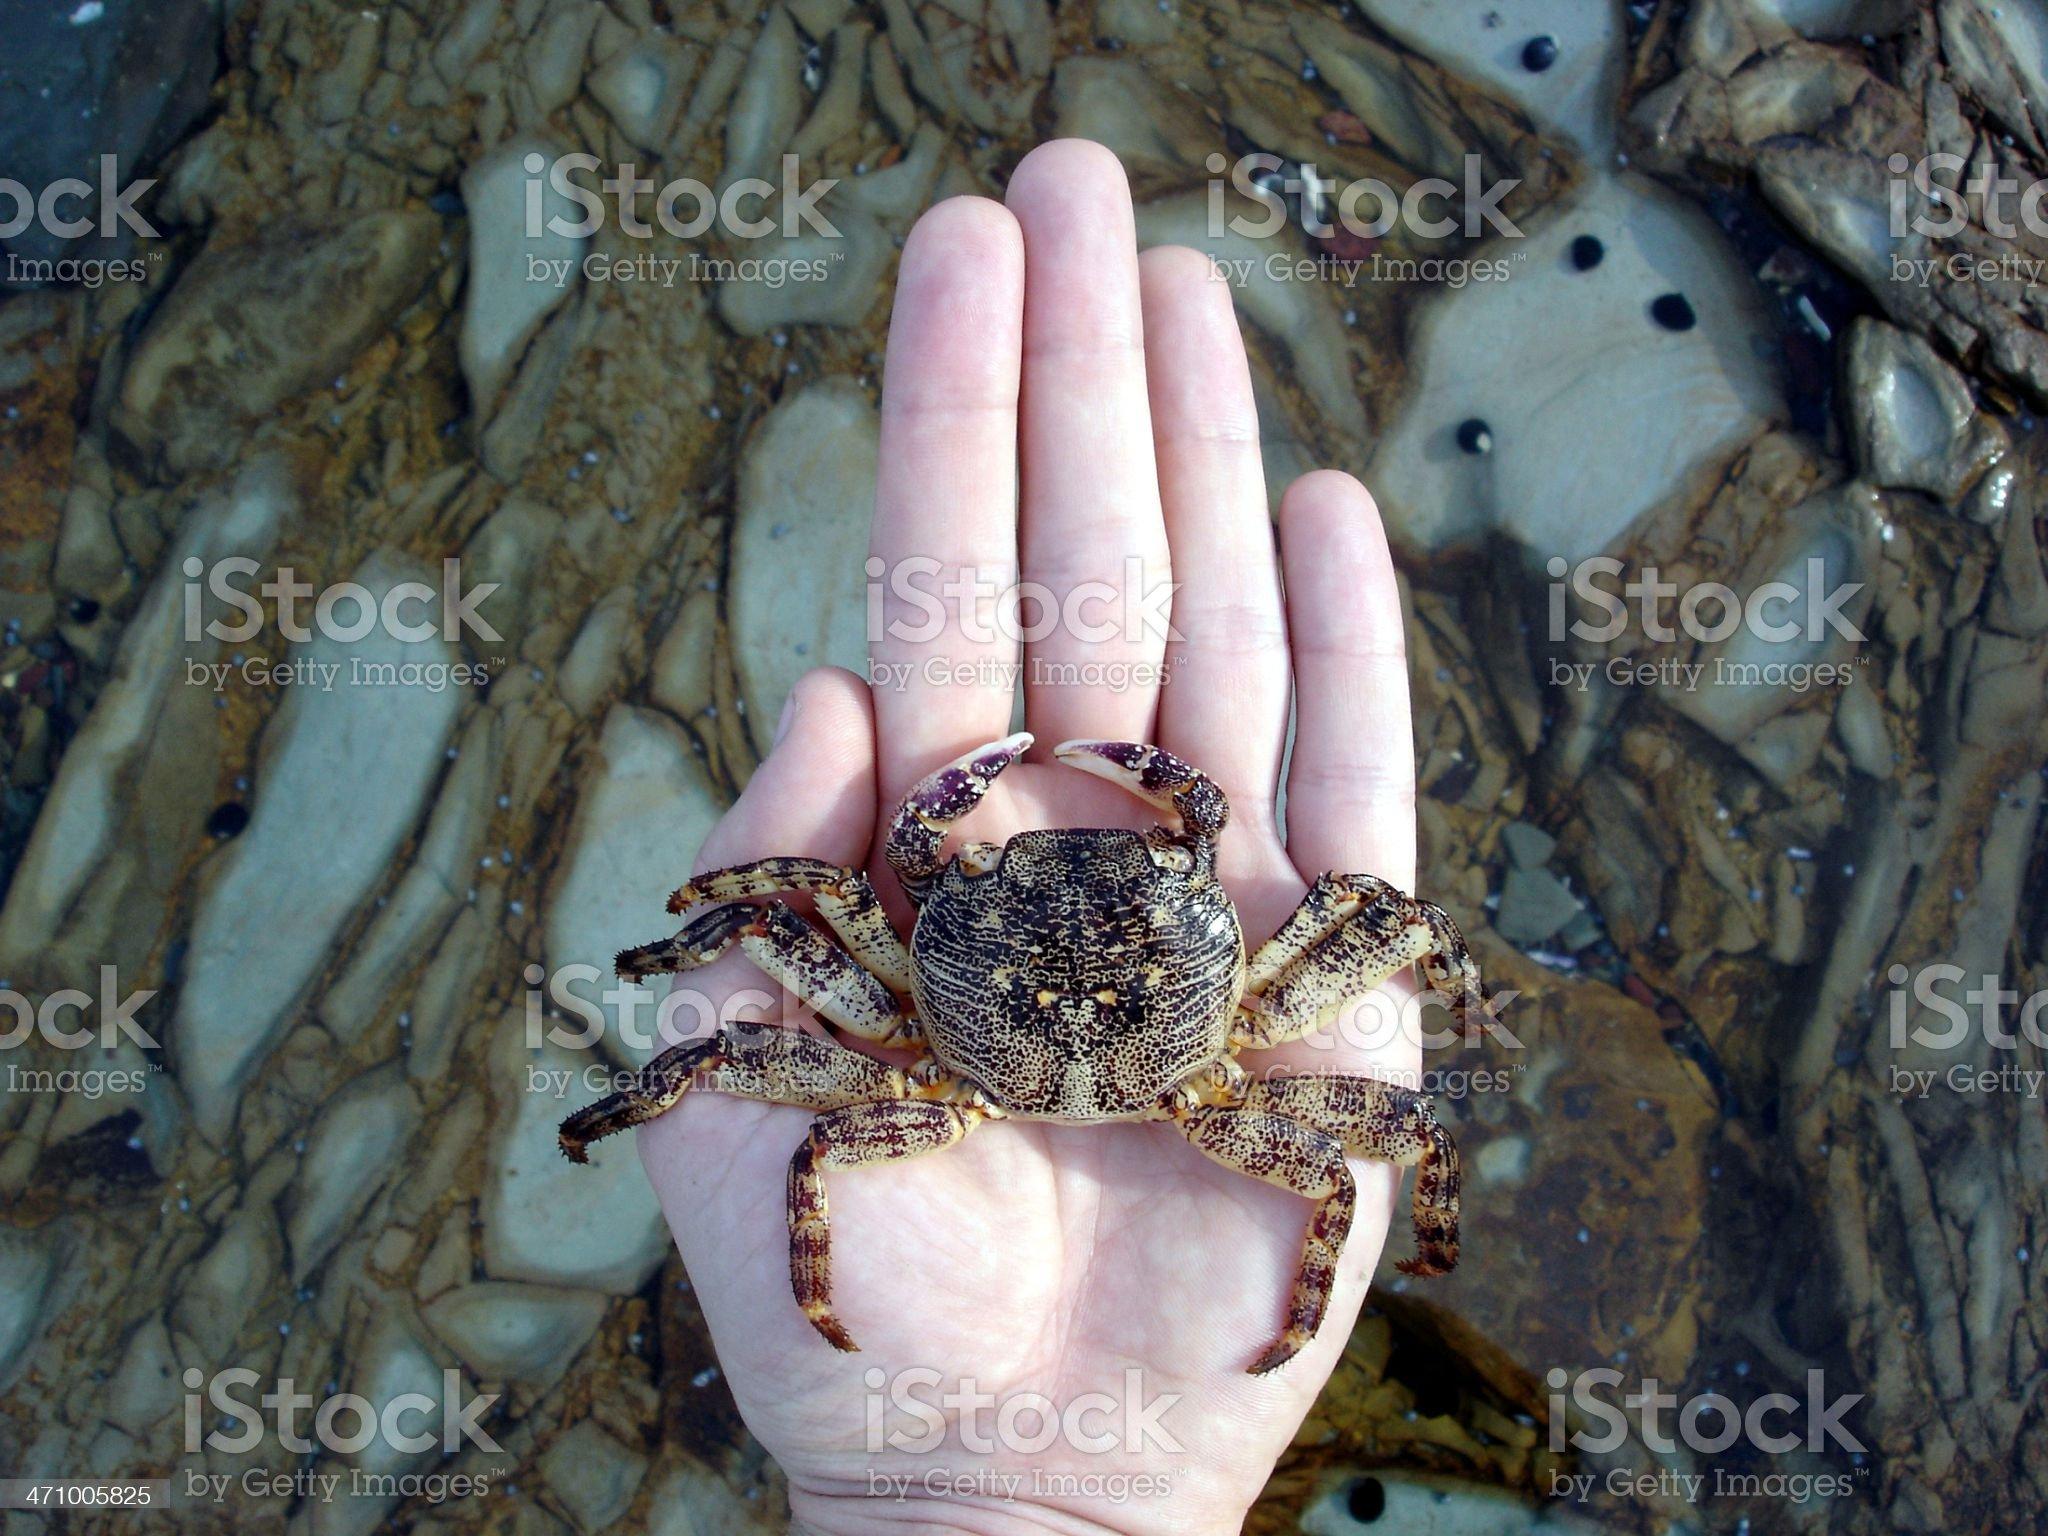 Caught Crab royalty-free stock photo